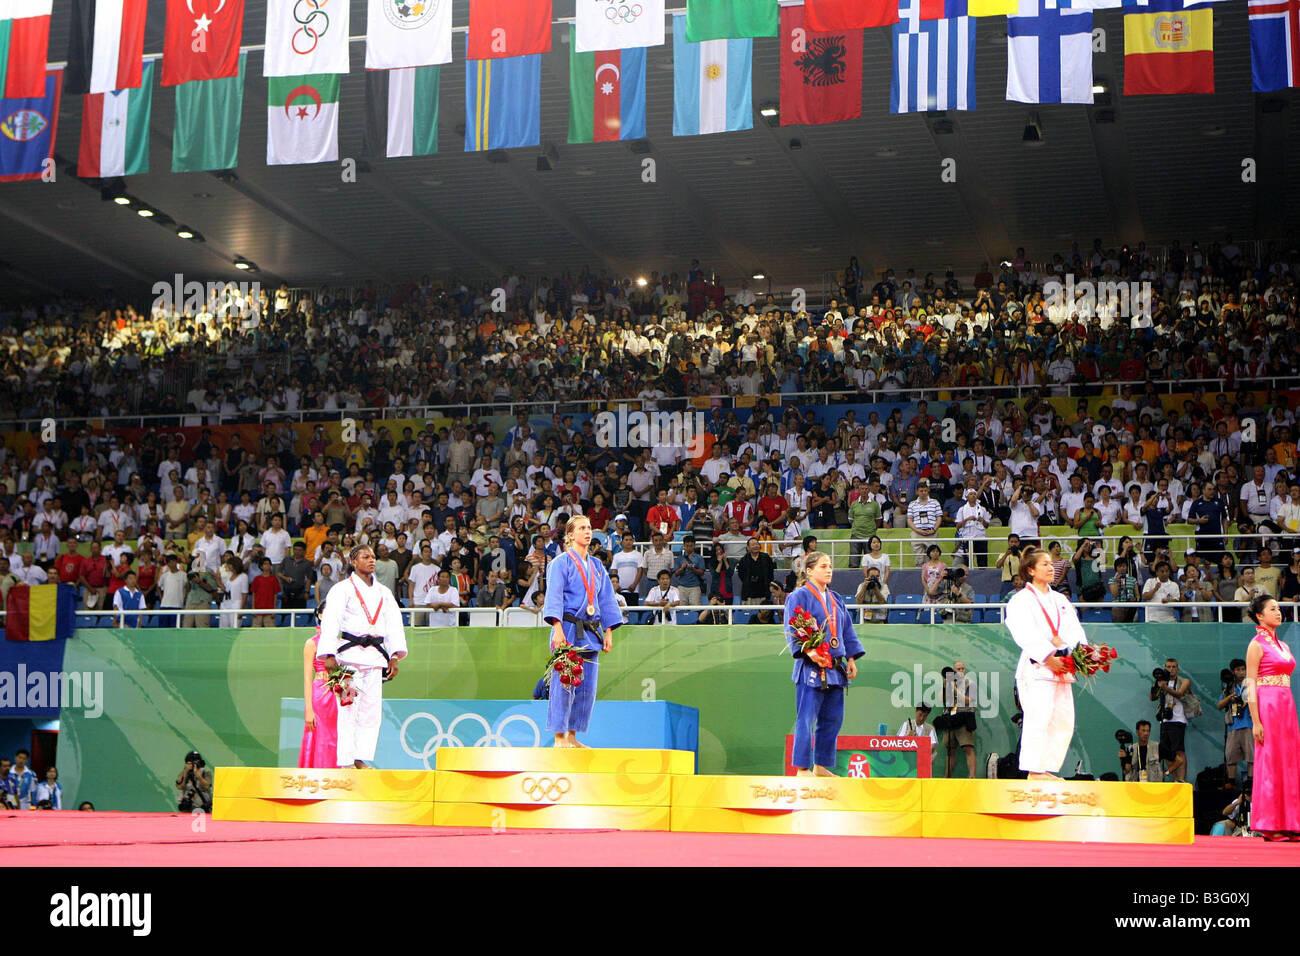 2008 Beijing Olympic Games - Stock Image